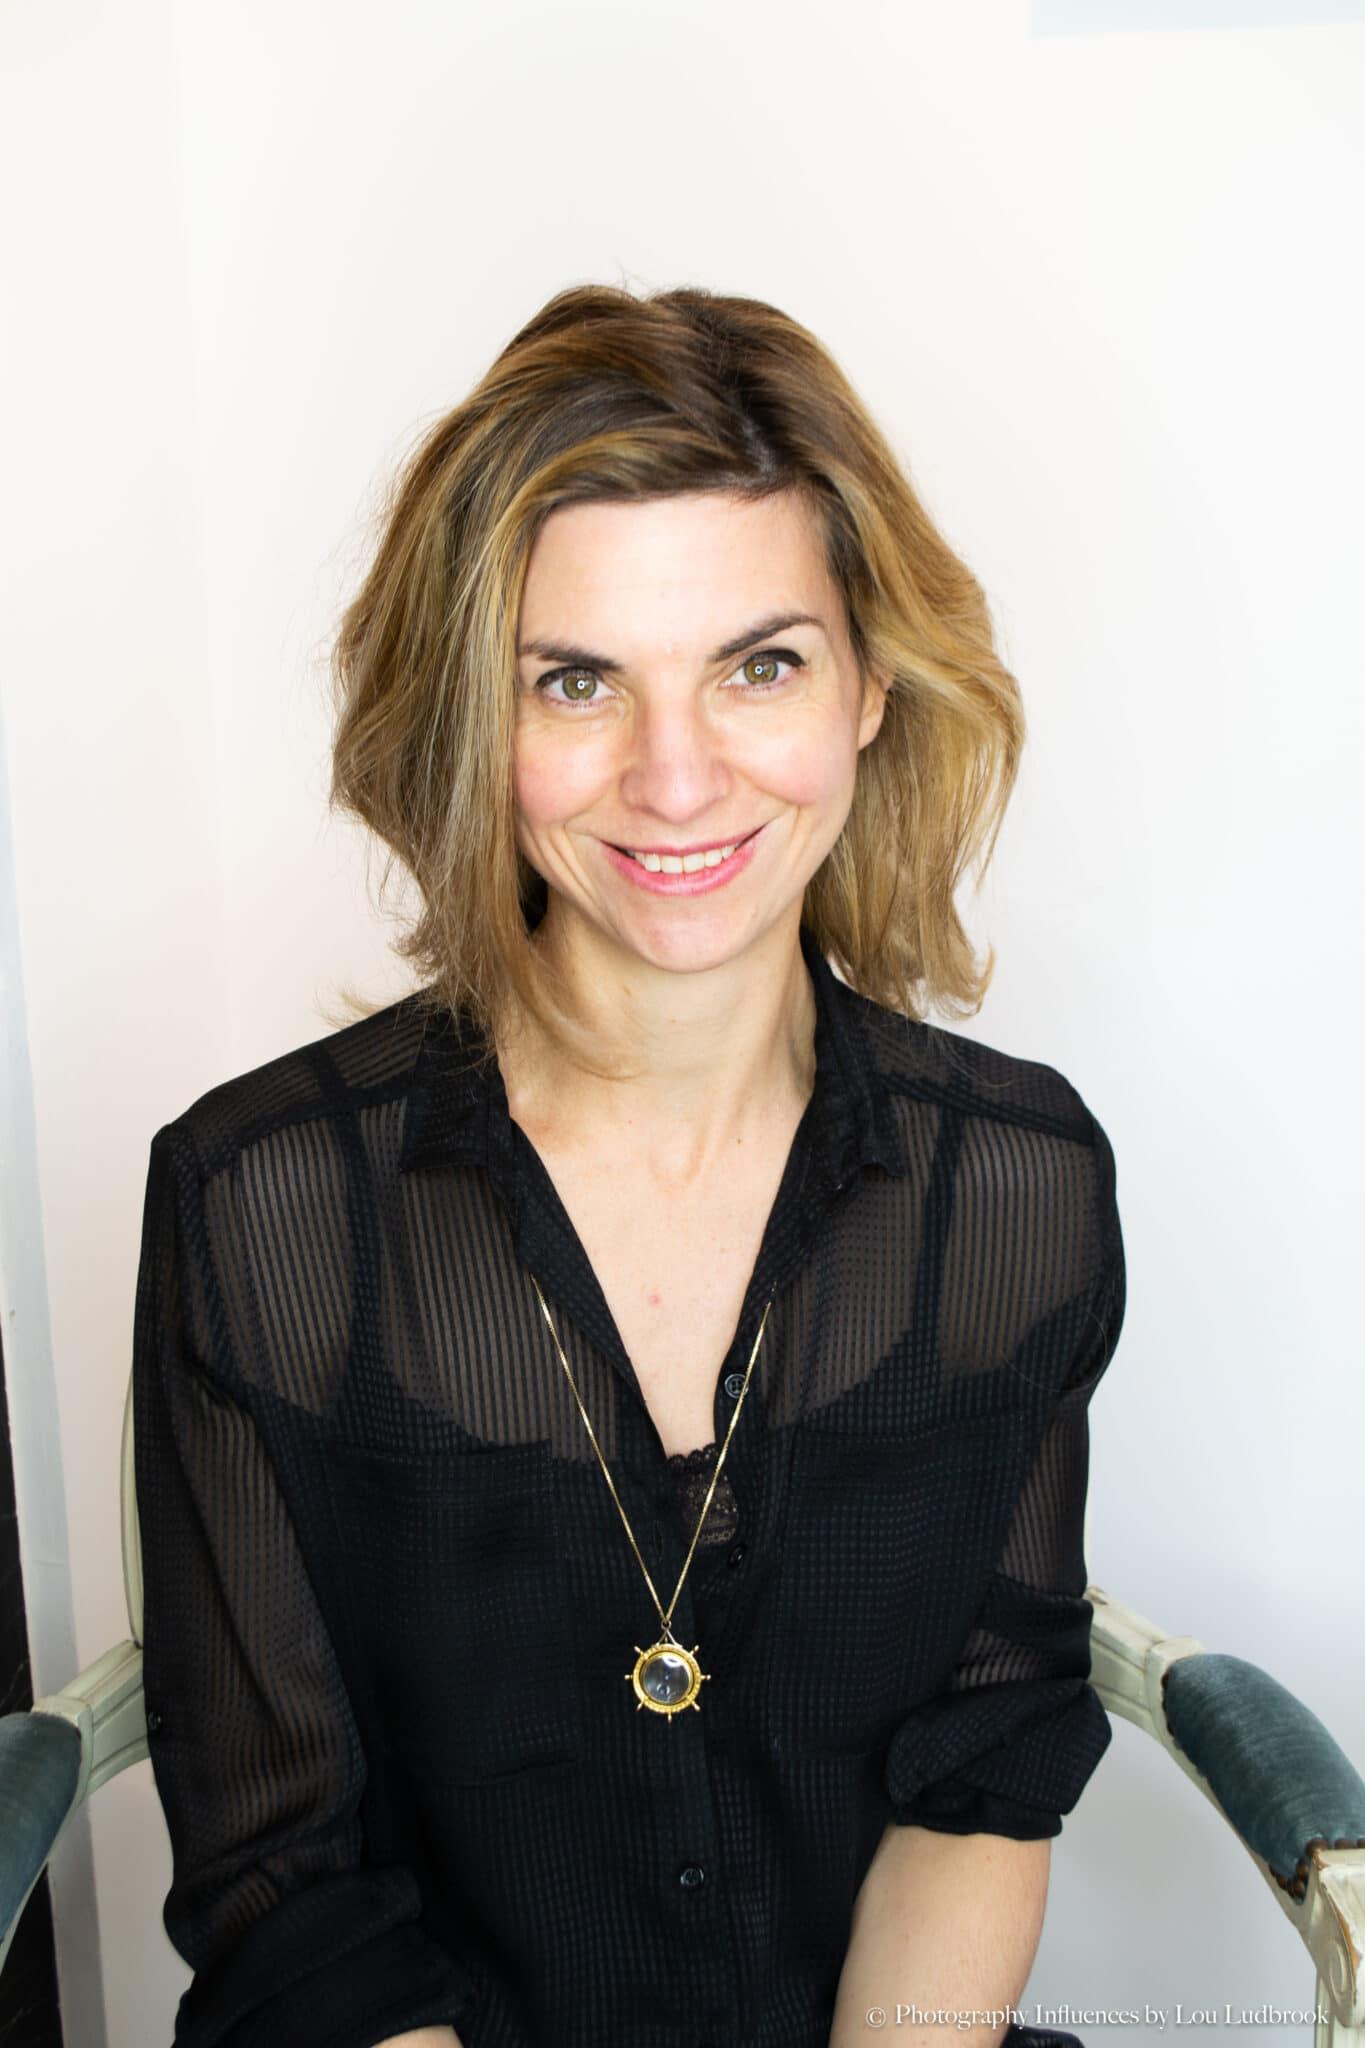 Sarah de Castro Comet